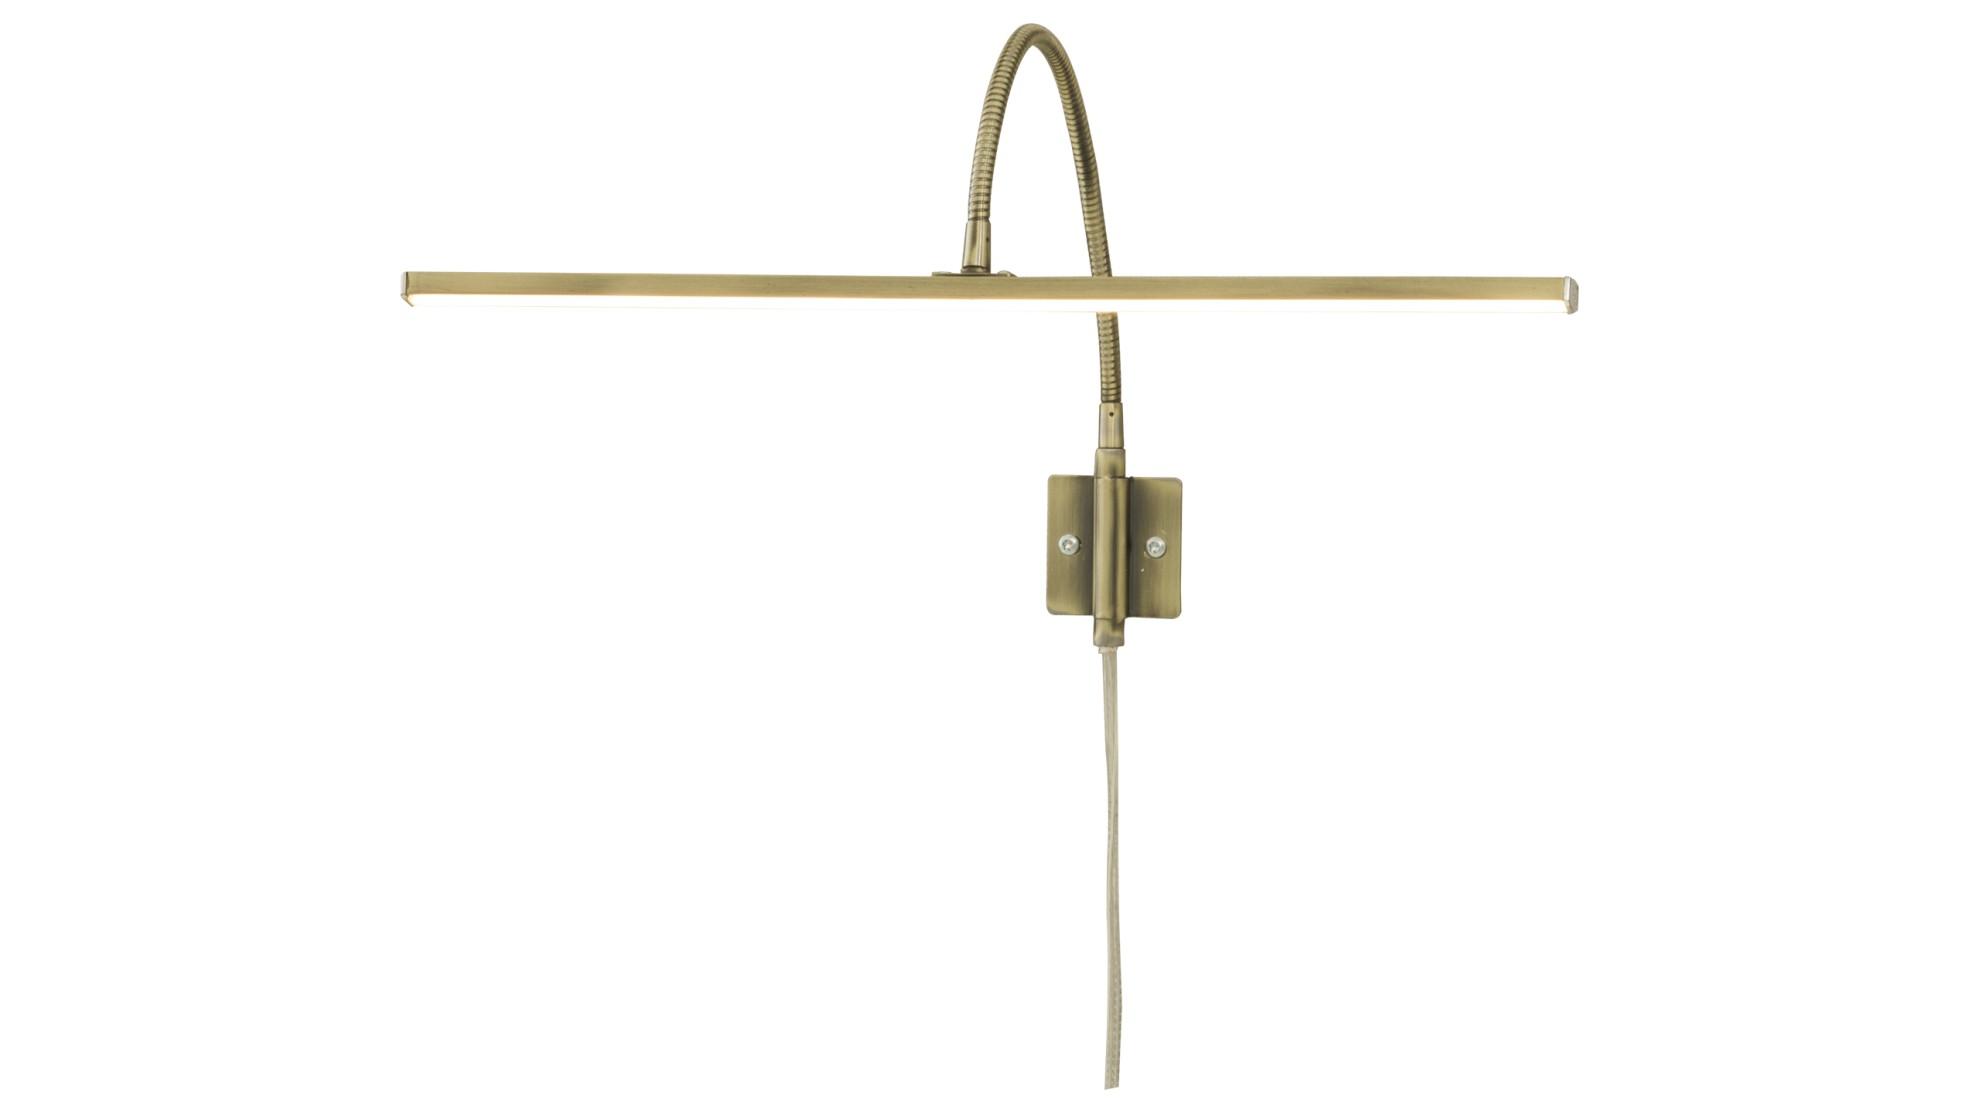 LED-Peilivalaisin, 60cm, 9.6W, 600lm, kromi